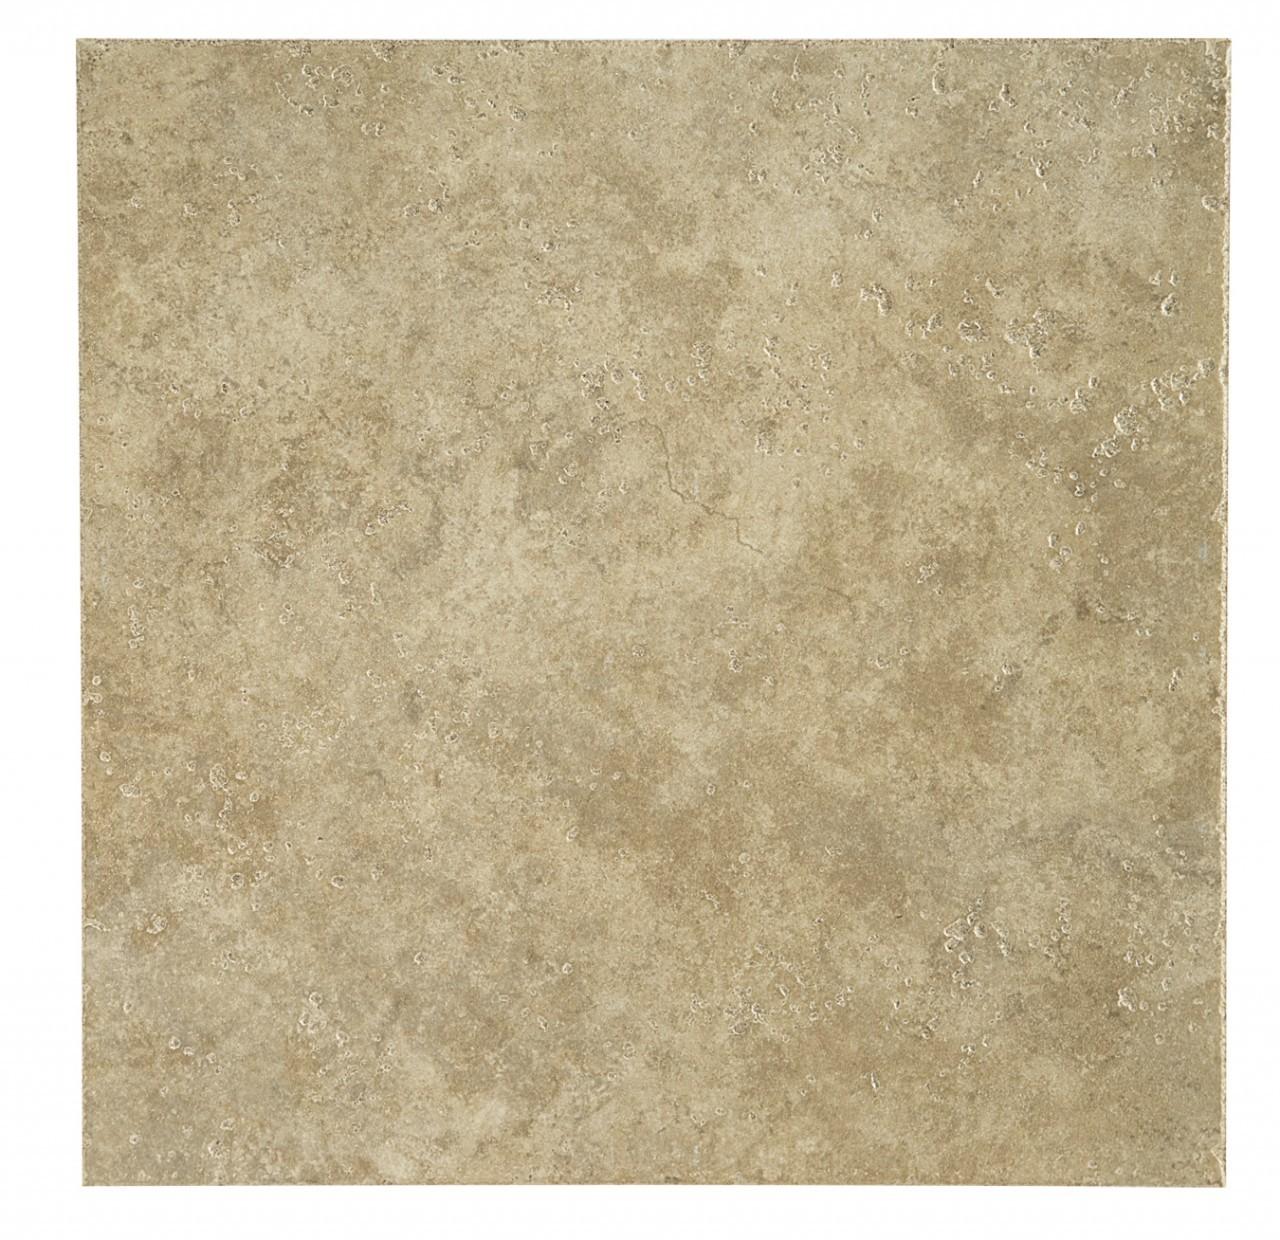 Tile maple ridge 16 brown maple for Flooring maple ridge